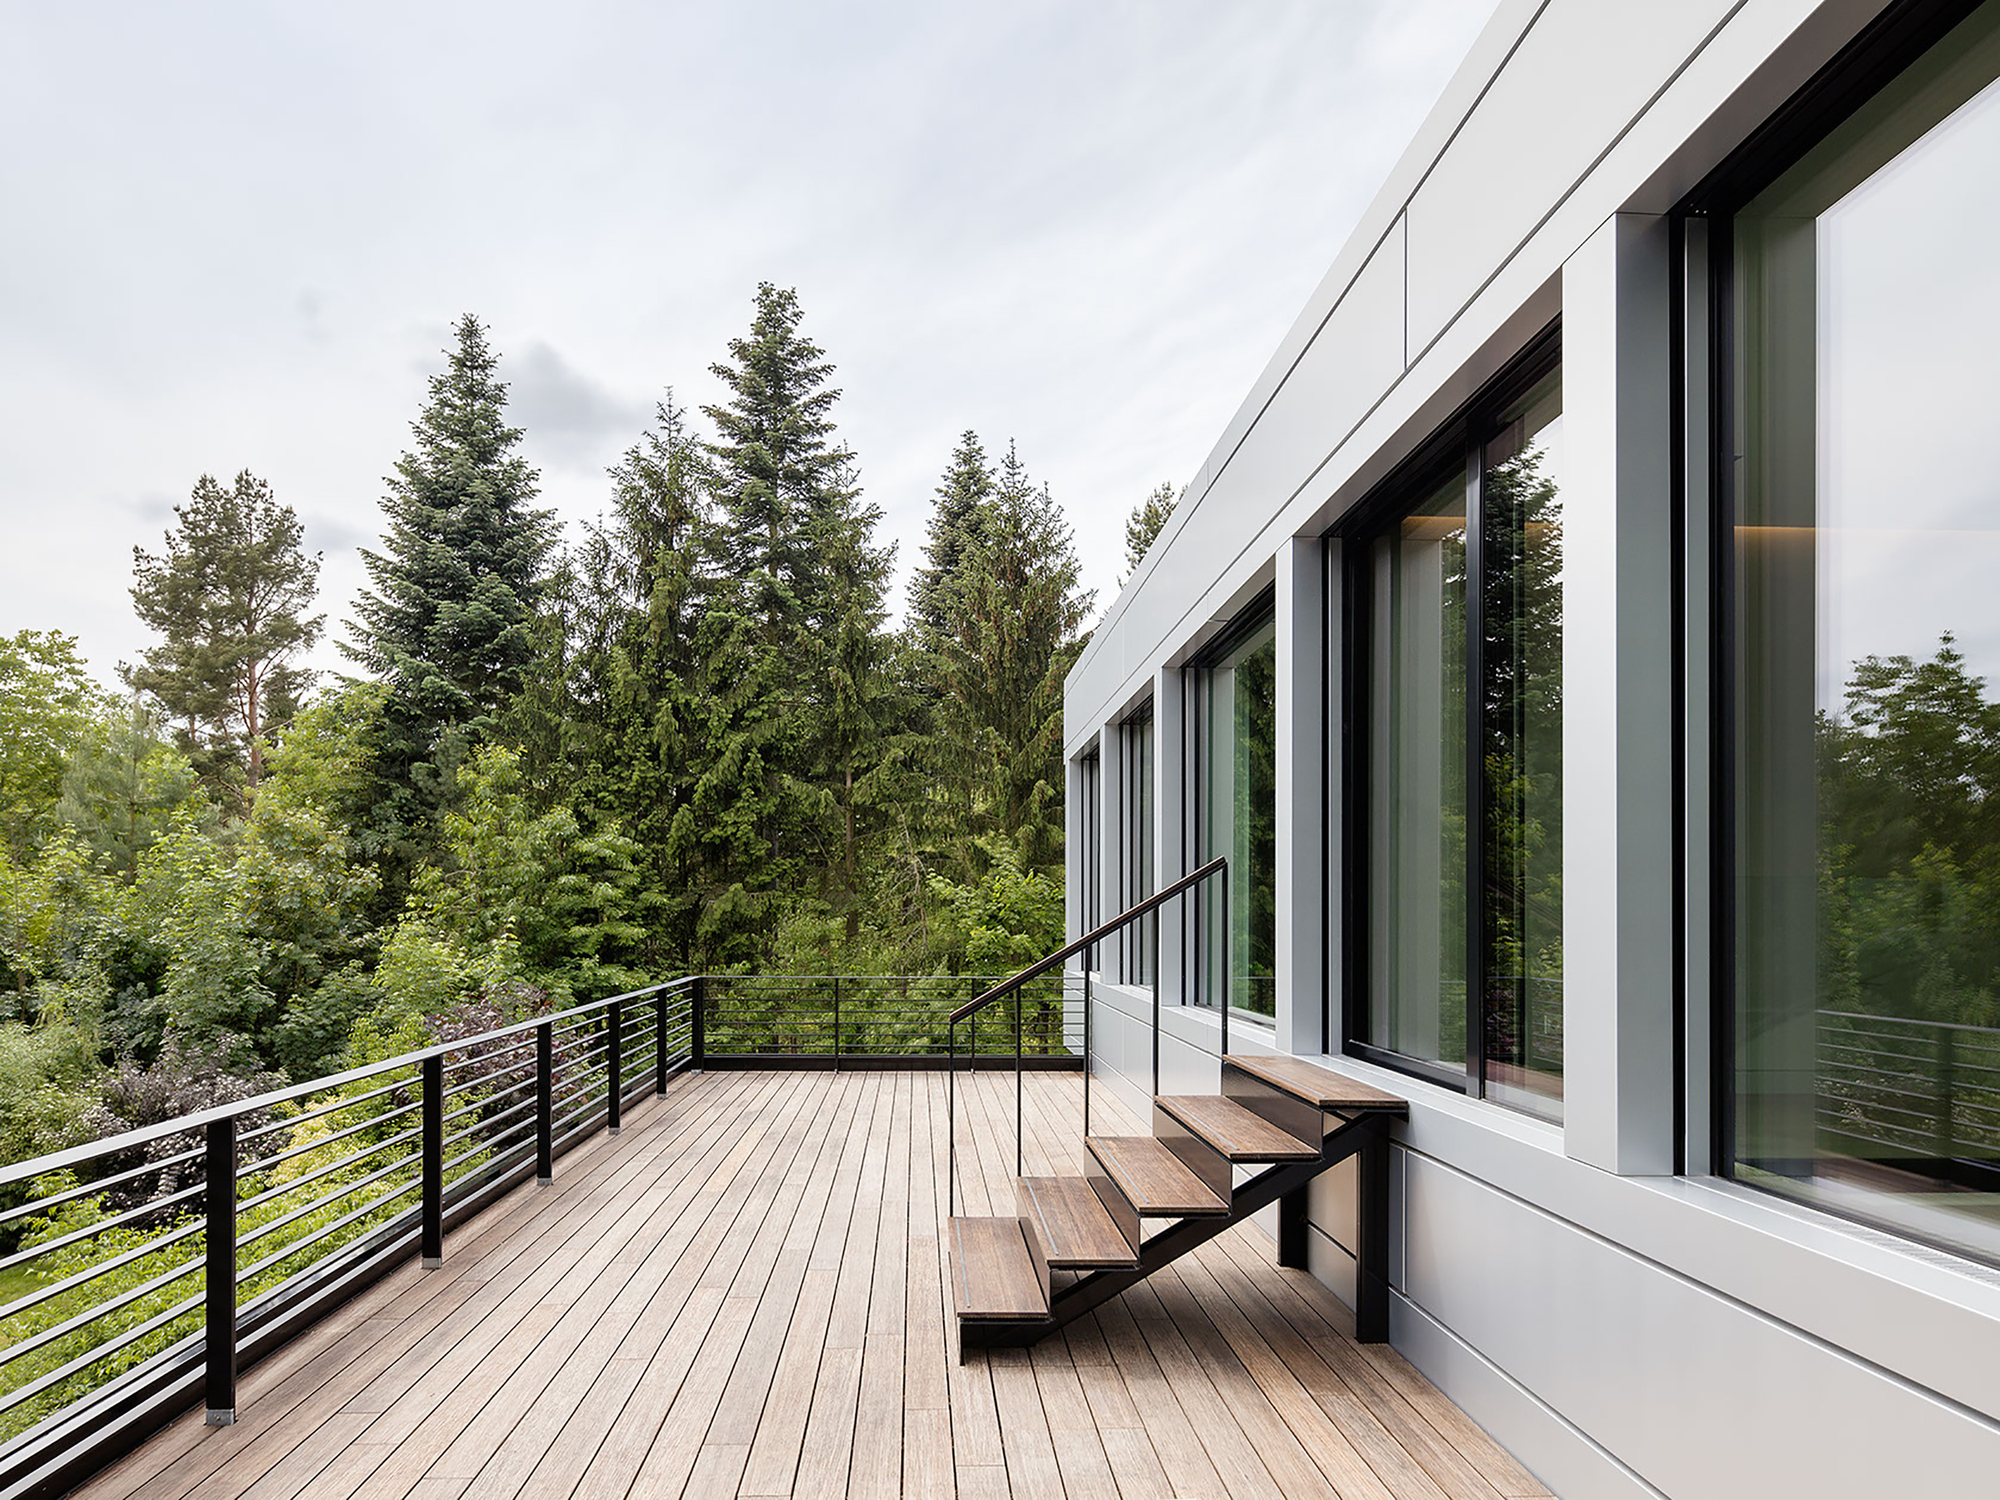 gallery of villa in potsdam tchoban voss architekten 2. Black Bedroom Furniture Sets. Home Design Ideas